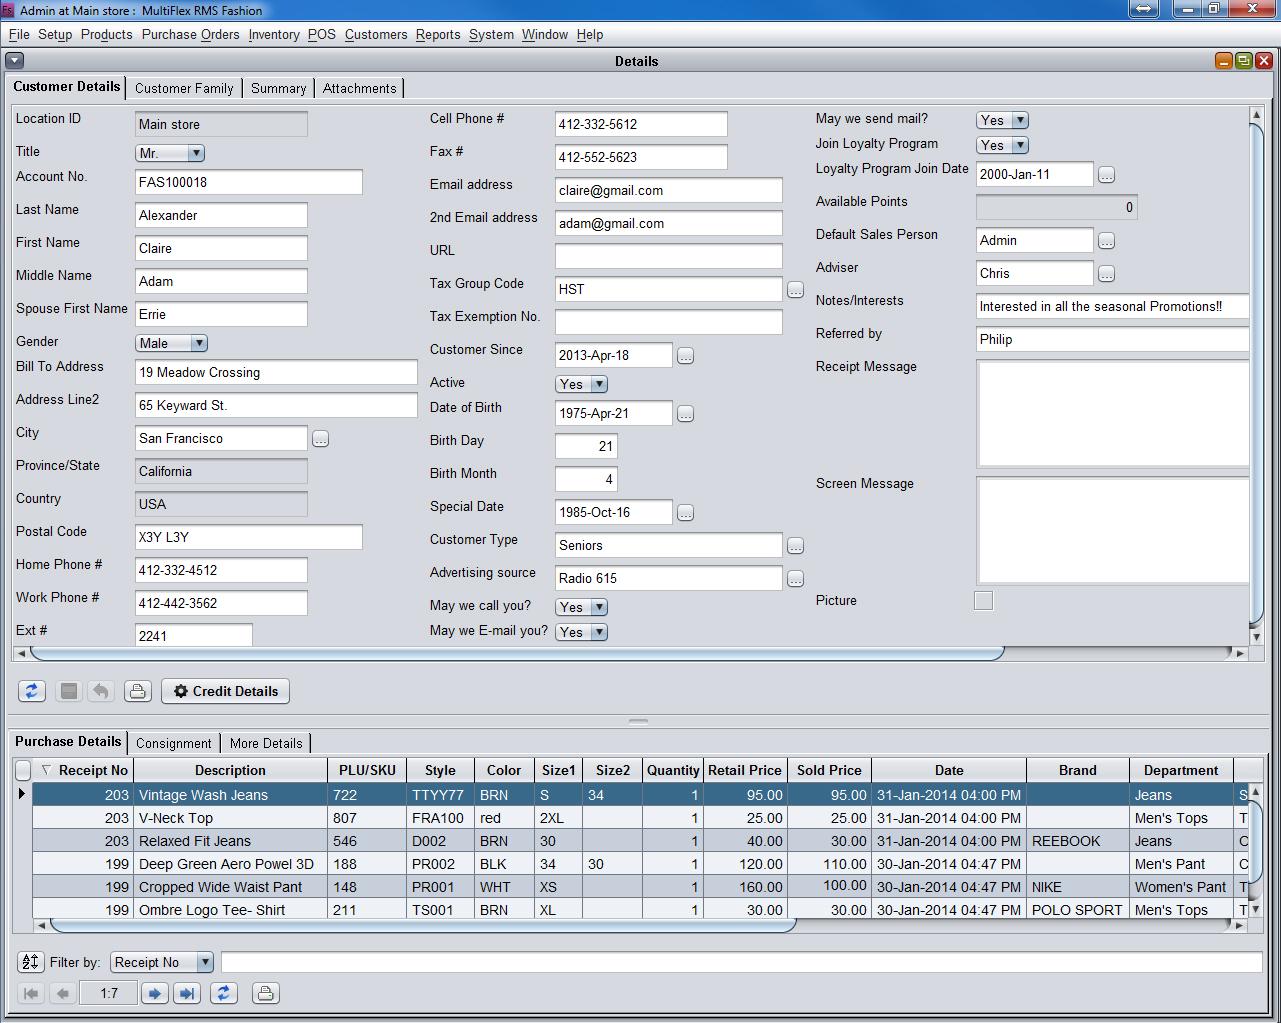 MultiFlex RMS Fashion and Apparel's customer data dashboard